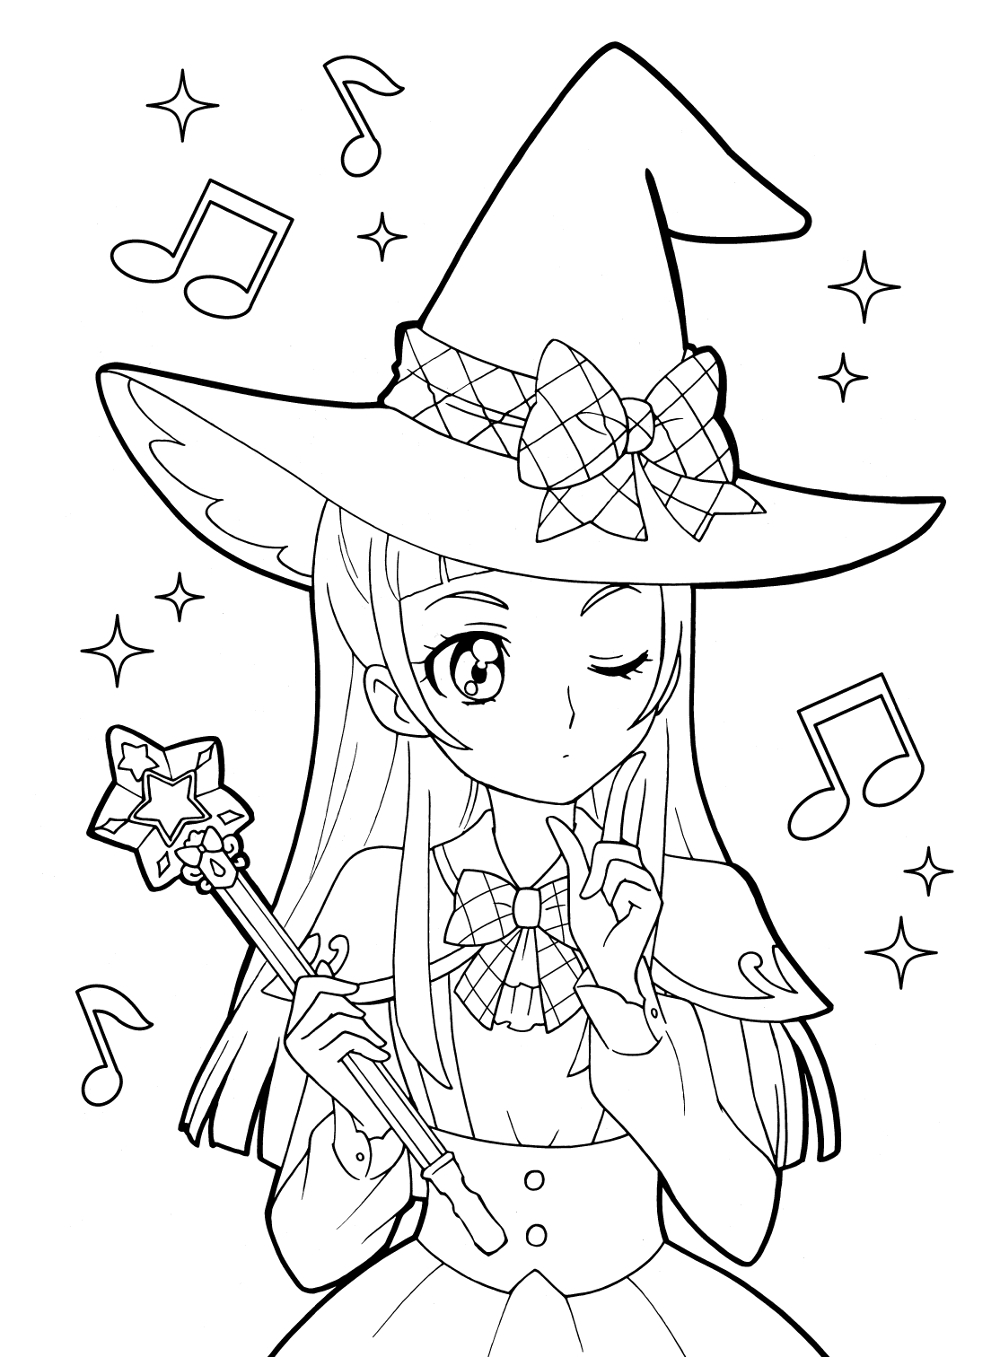 Anime malvorlagen free - 28 images - anime template for